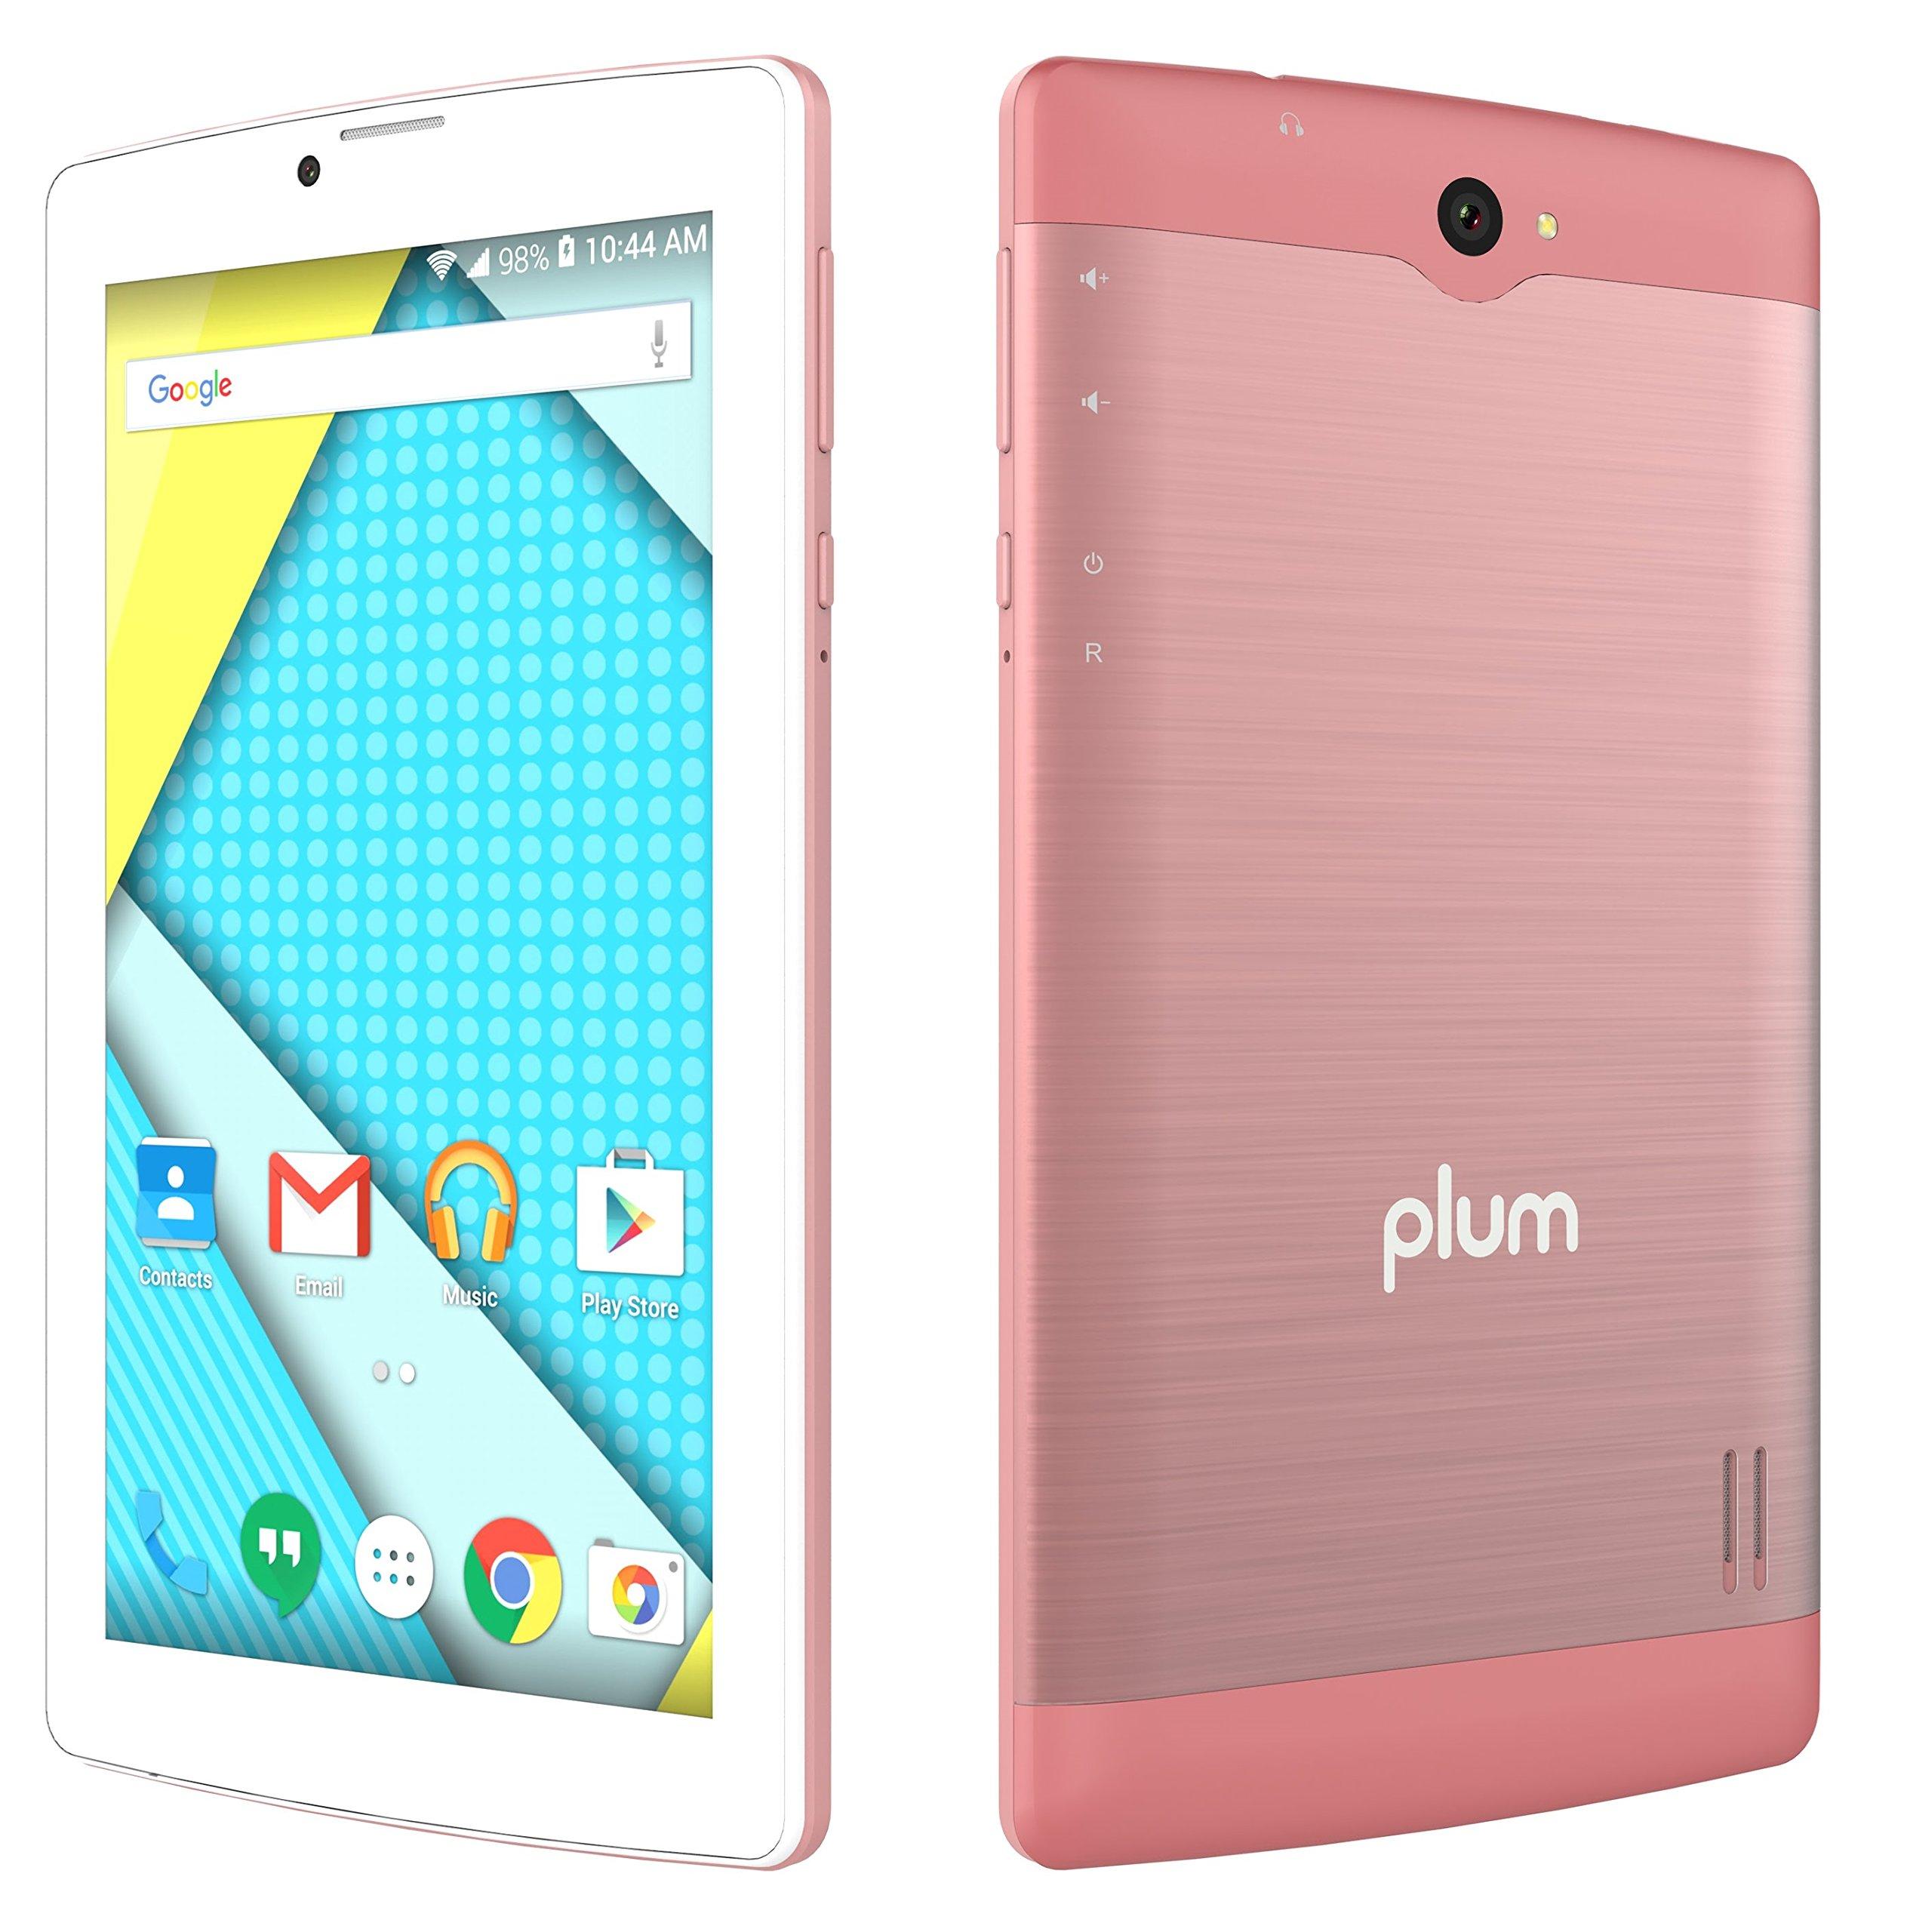 "Plum Optimax 12 - Tablet Phone Phablet 4G GSM Unlocked 7"" Display Android Dual Camera ATT Tmobile Metro Cricket Mint Straight Talk"